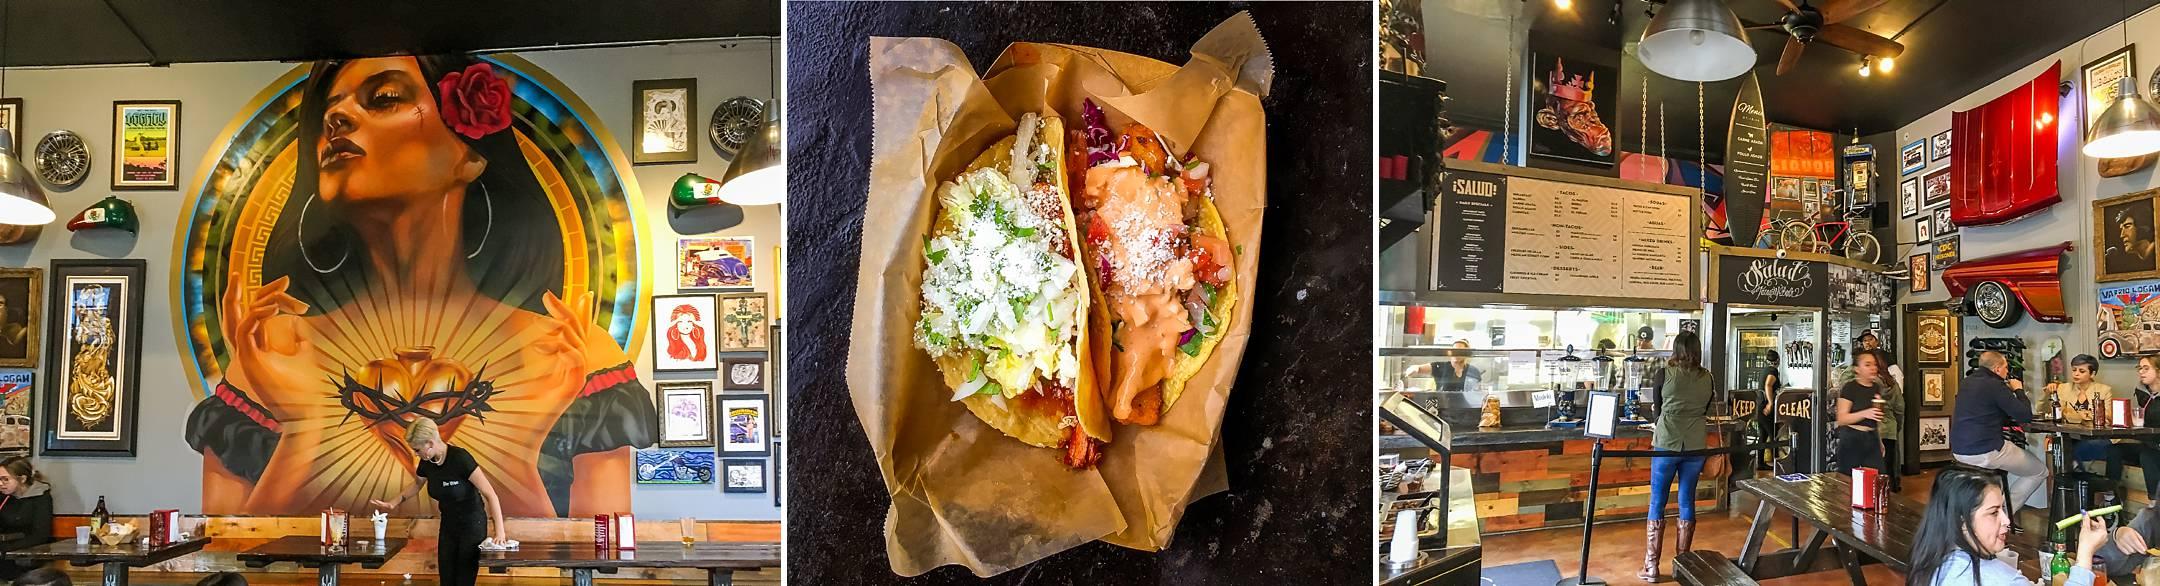 Salud Tacos San Diego